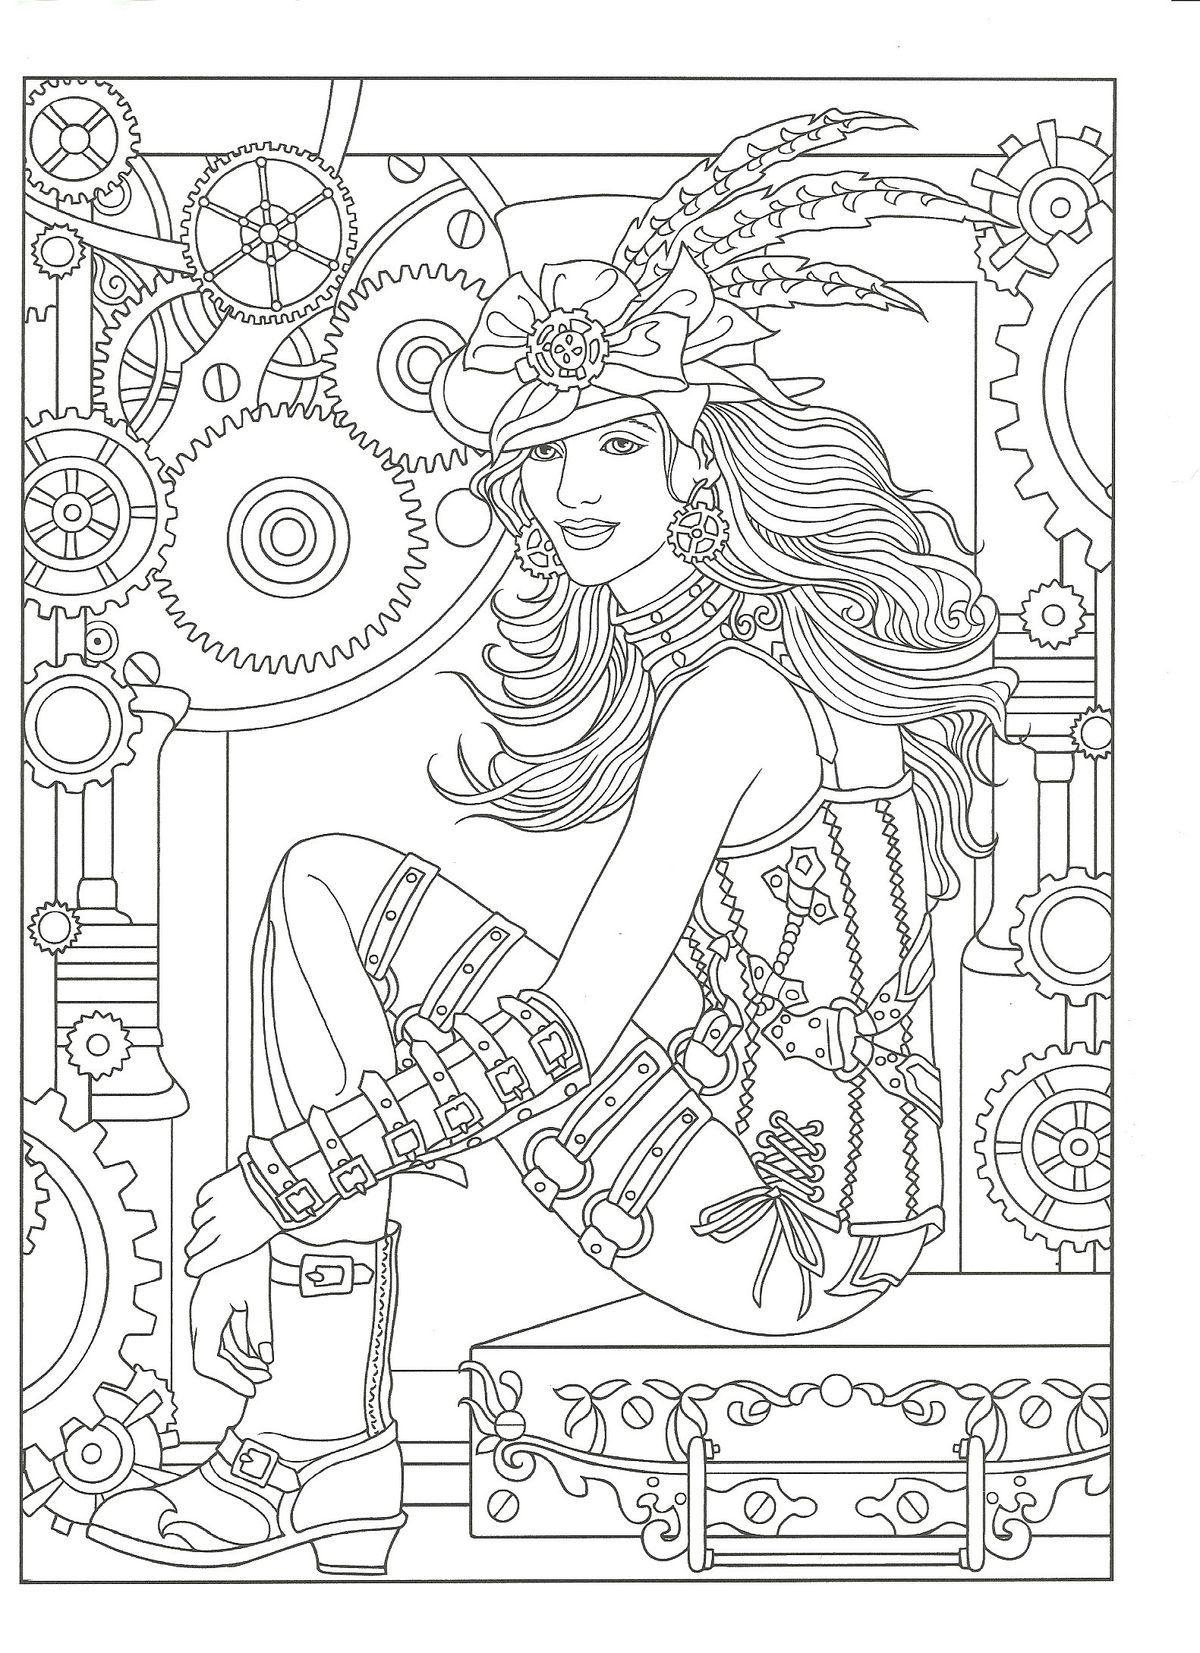 Pin von Val Wilson auf Coloring pages | Pinterest